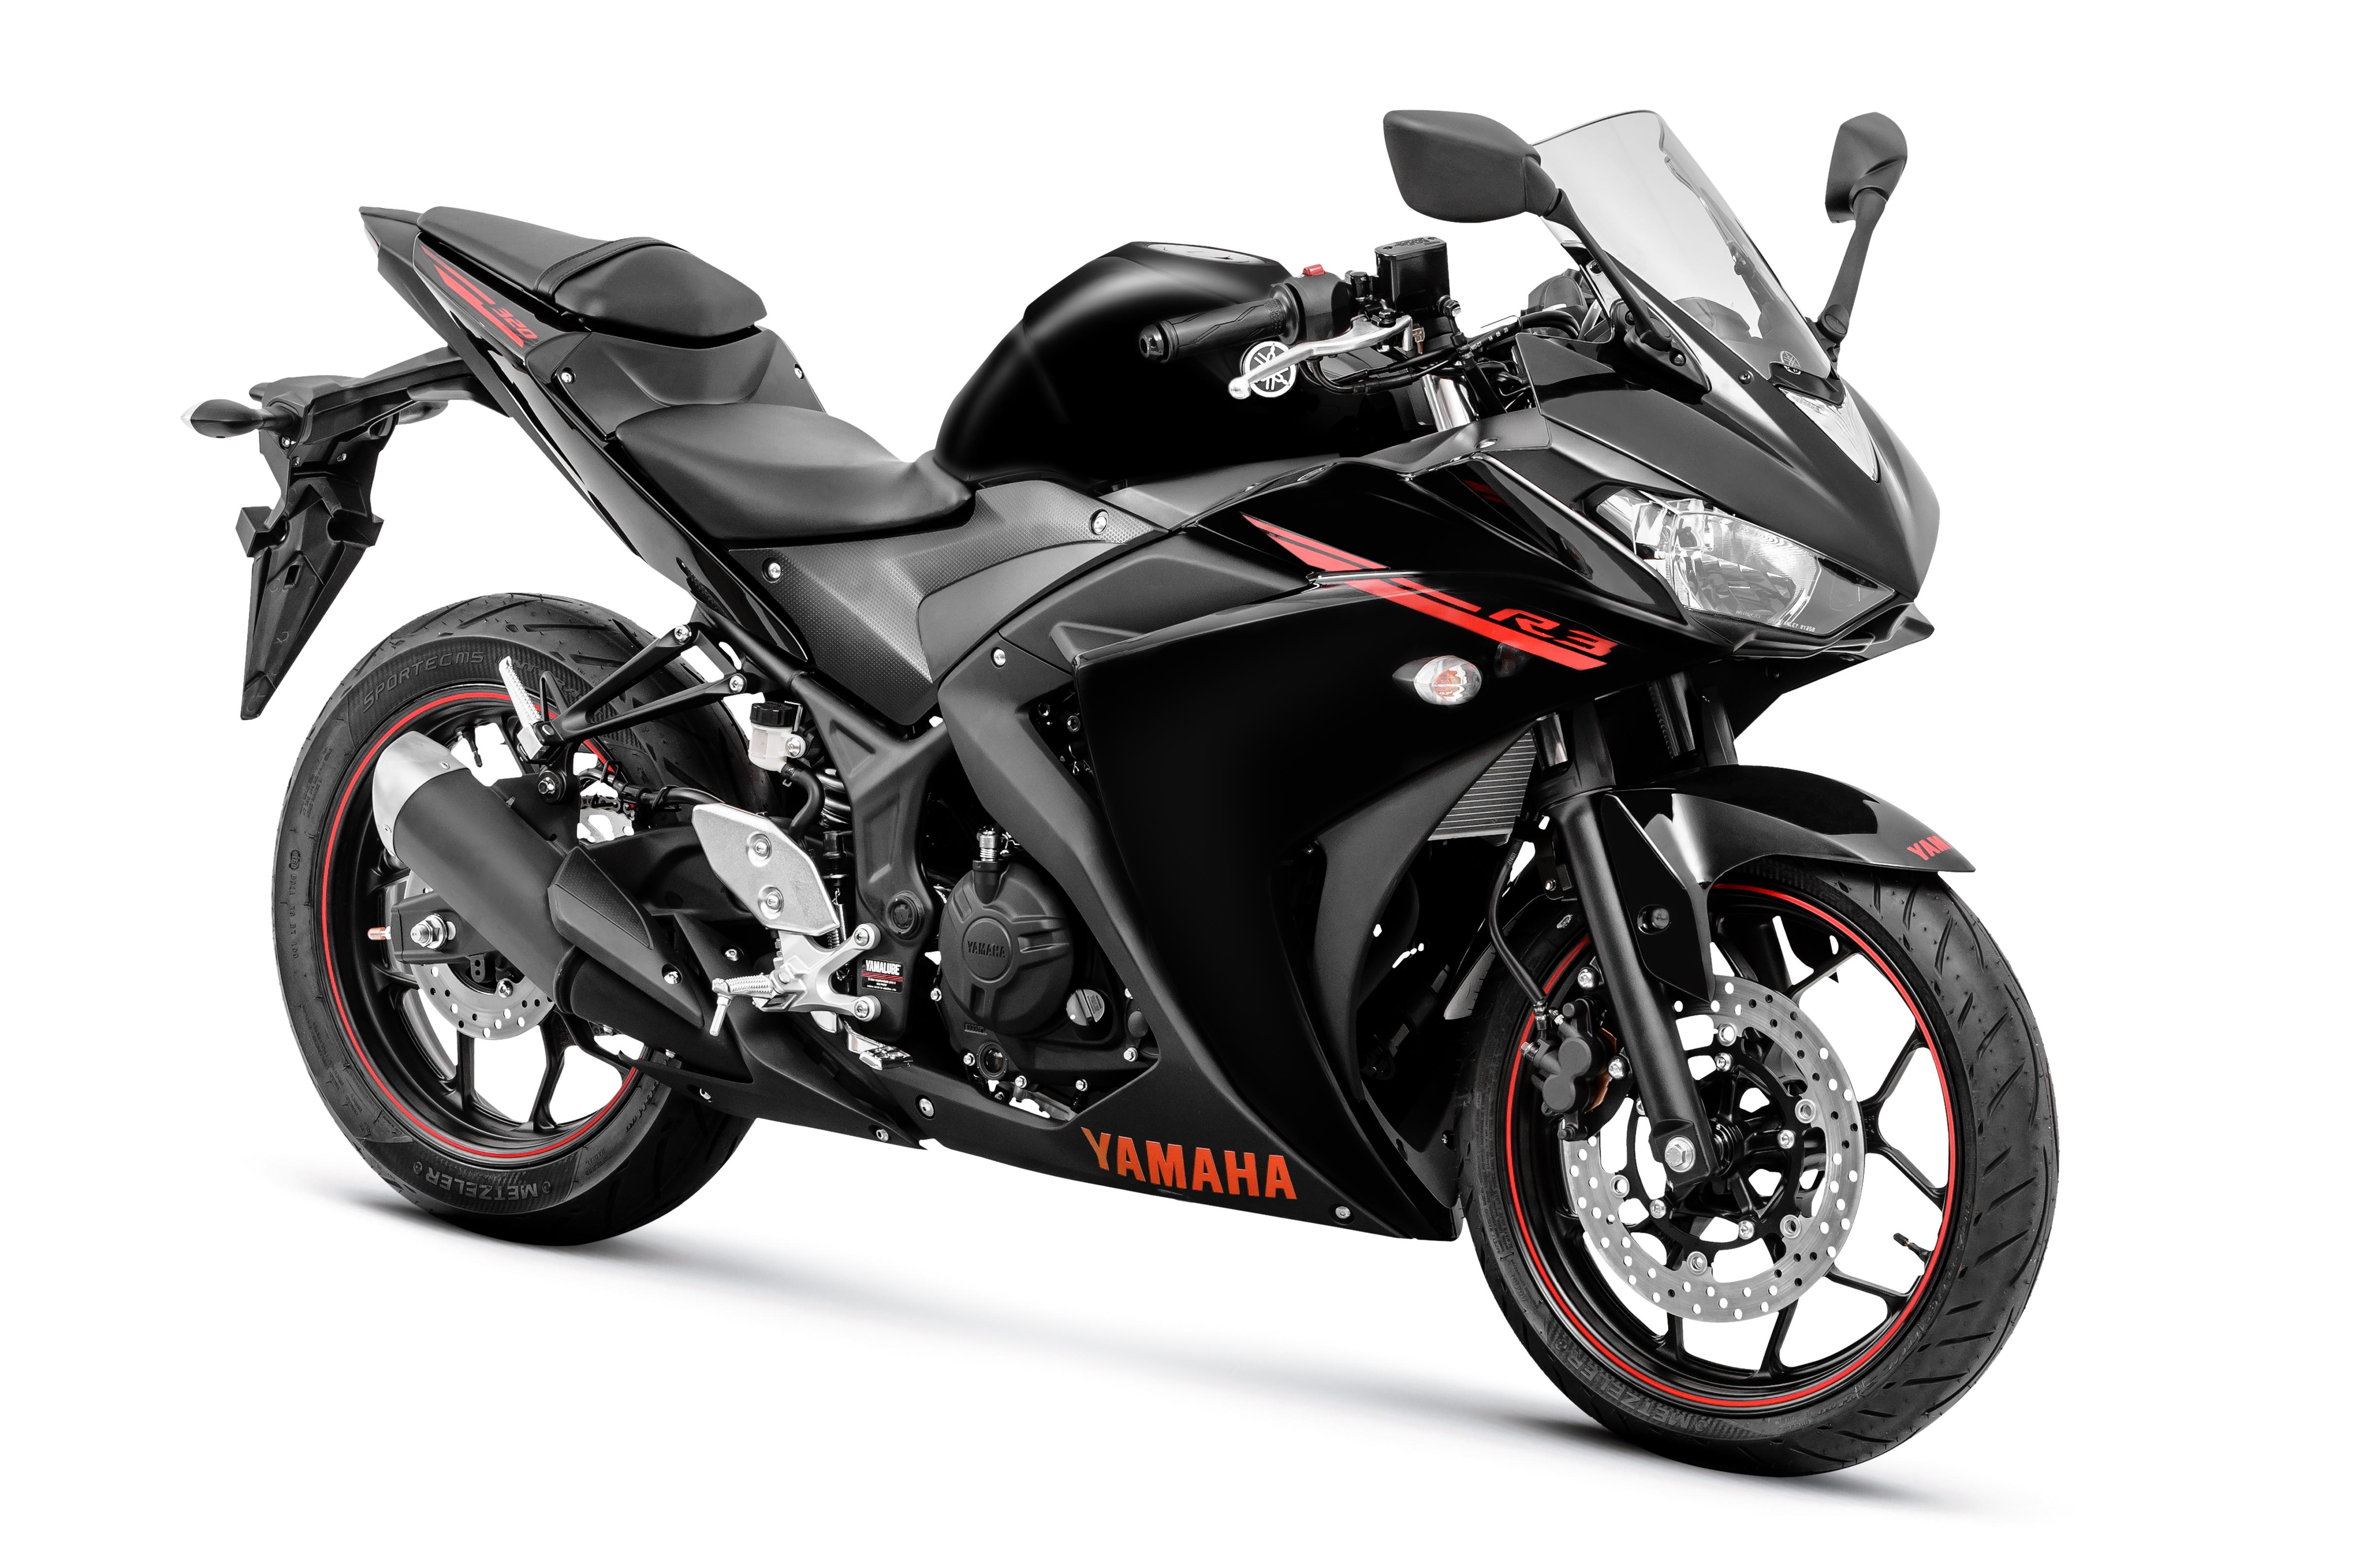 Yamaha R3 2019 >> Ficha técnica da Yamaha R3 2016 a 2019